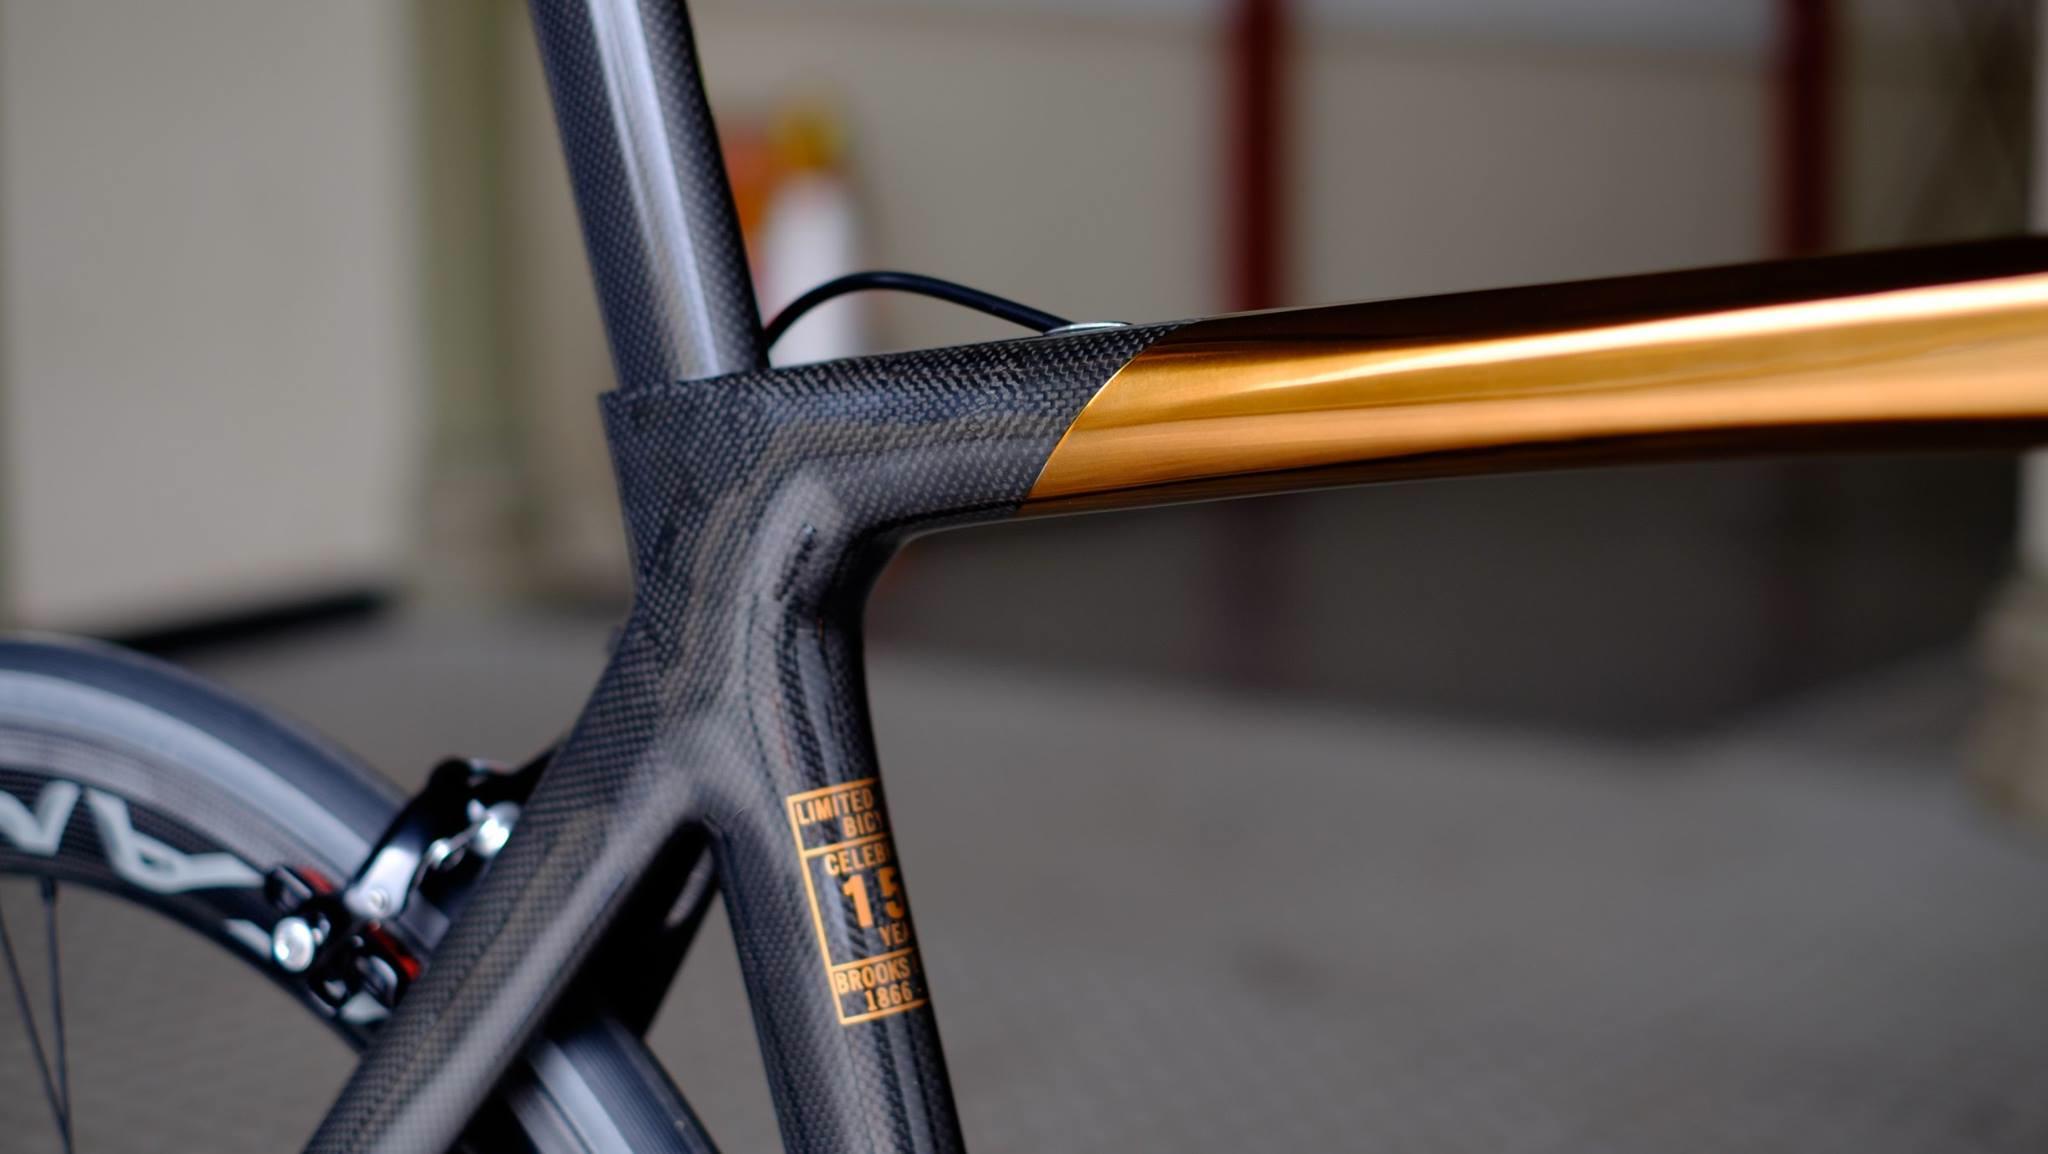 #BikePorn – the explosion of customised bikes